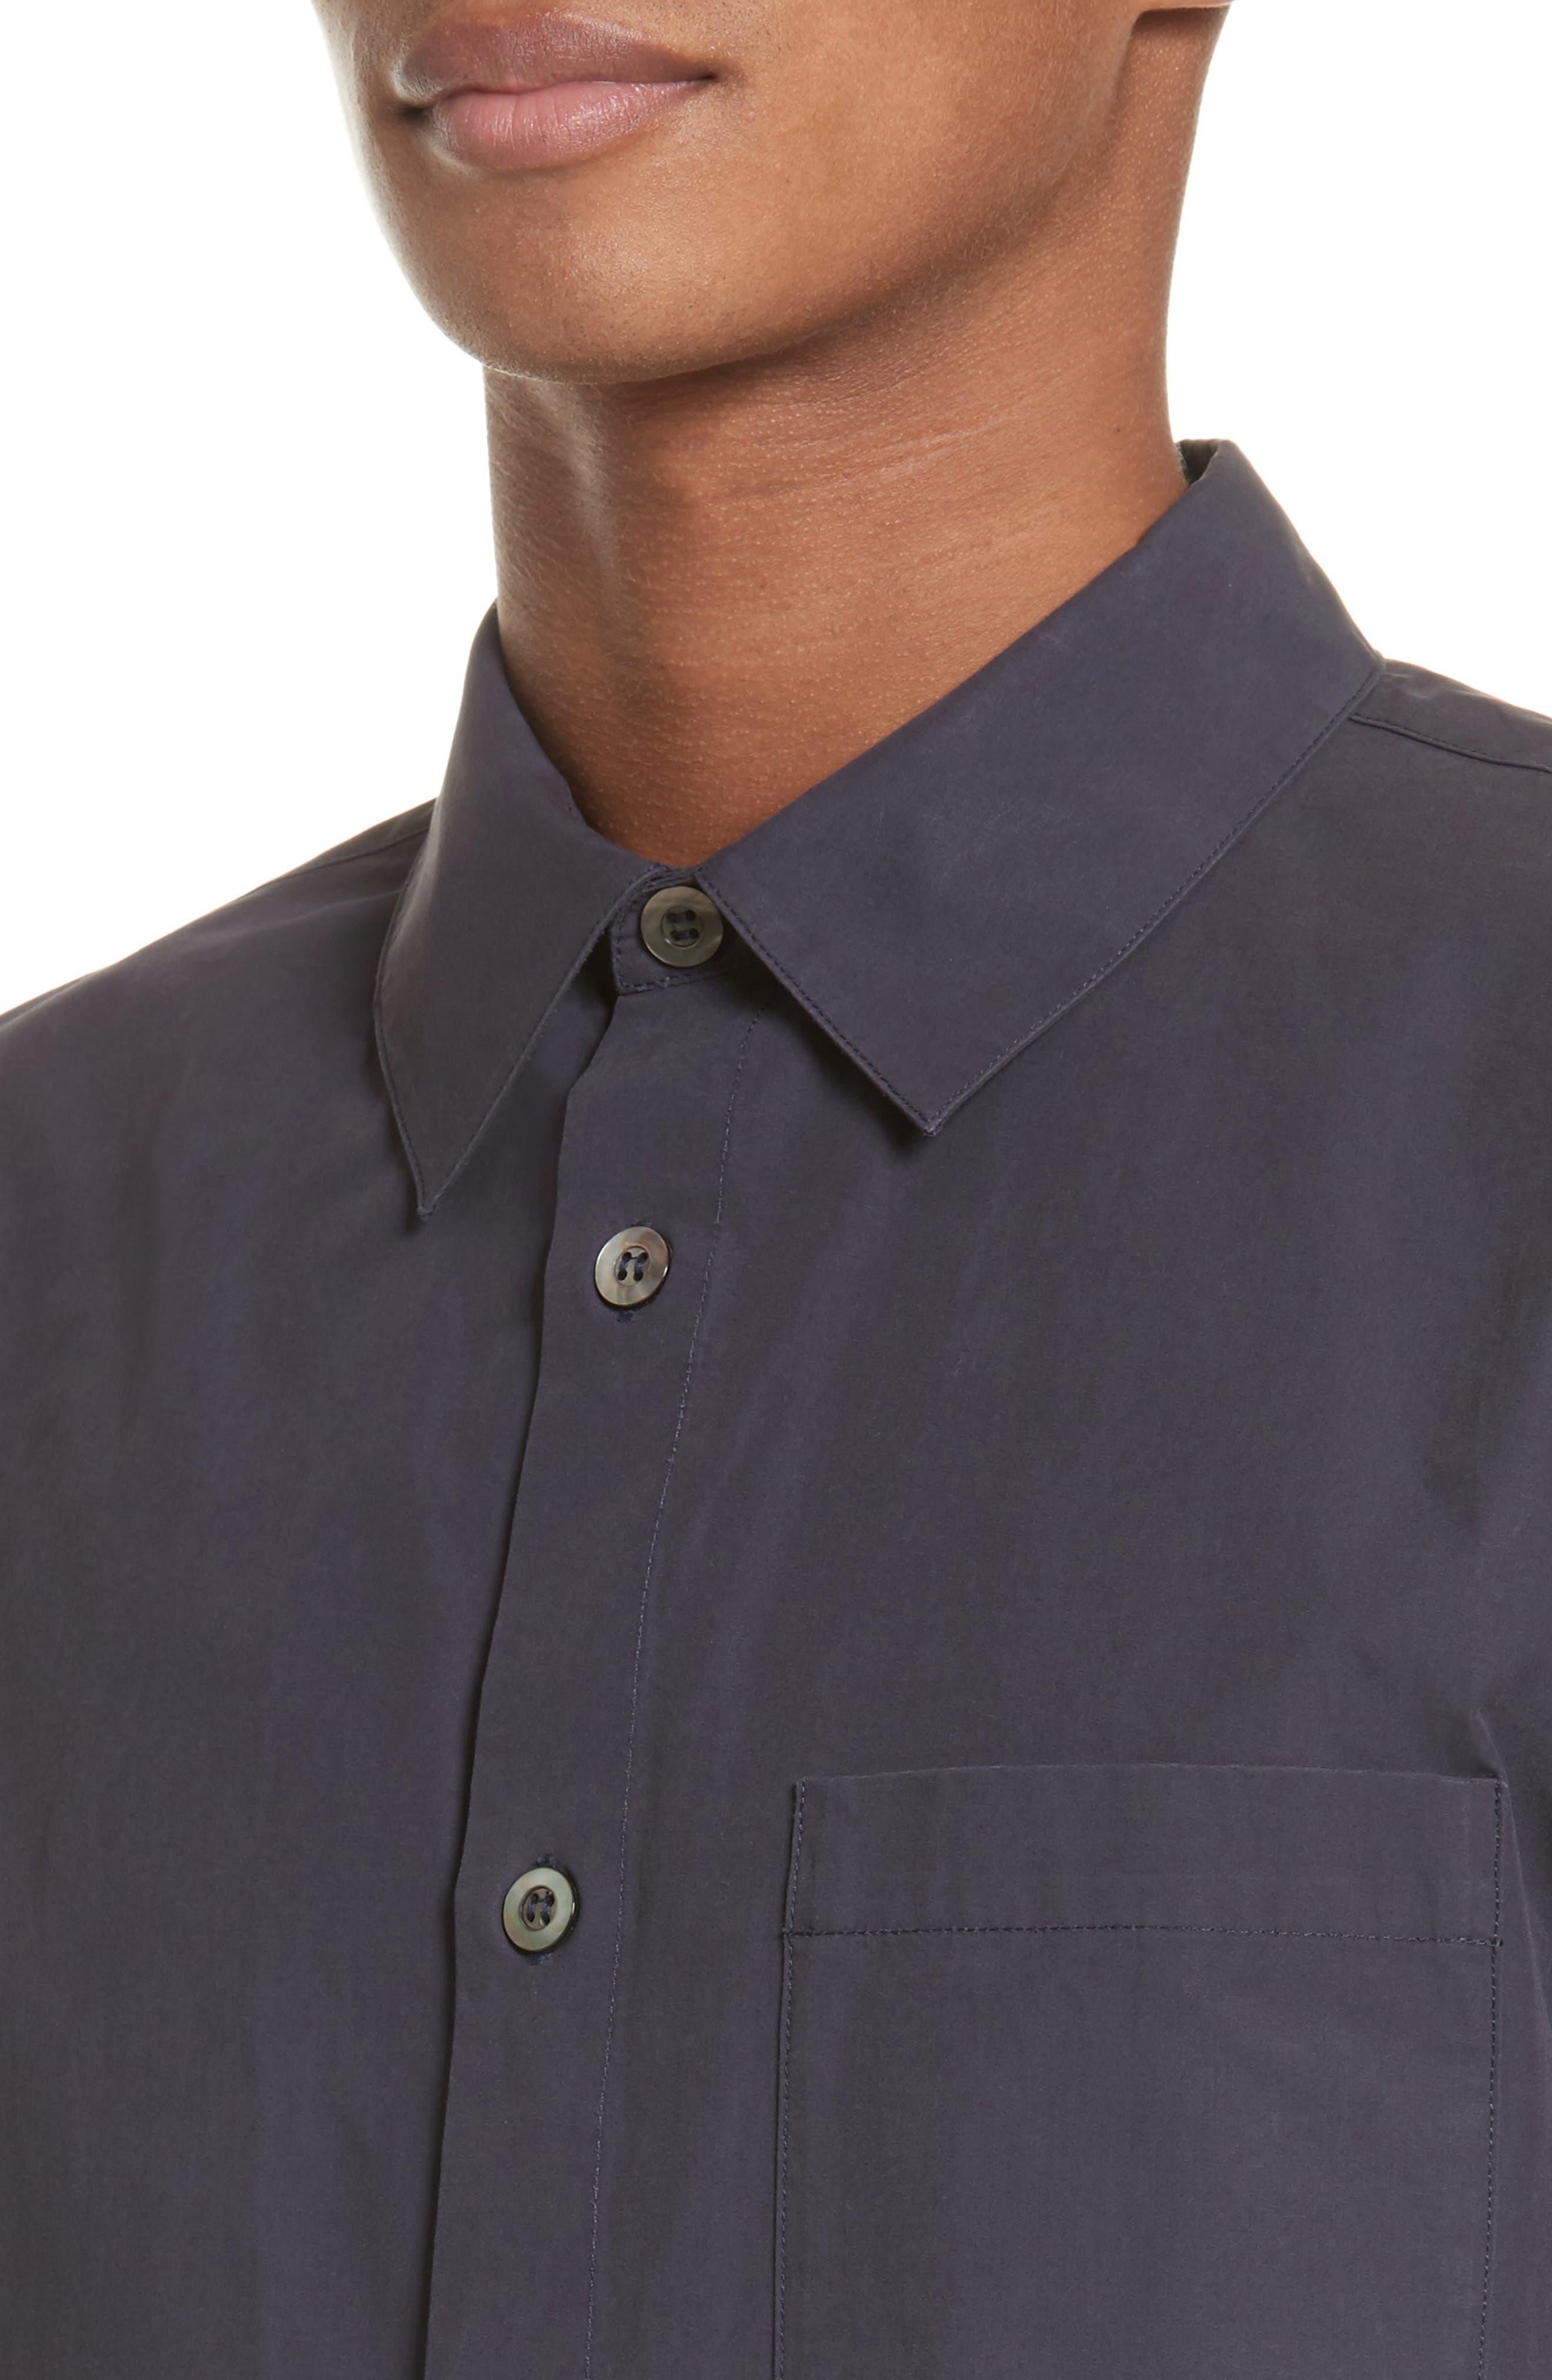 Cippi Poplin Woven Shirt,                             Alternate thumbnail 4, color,                             410